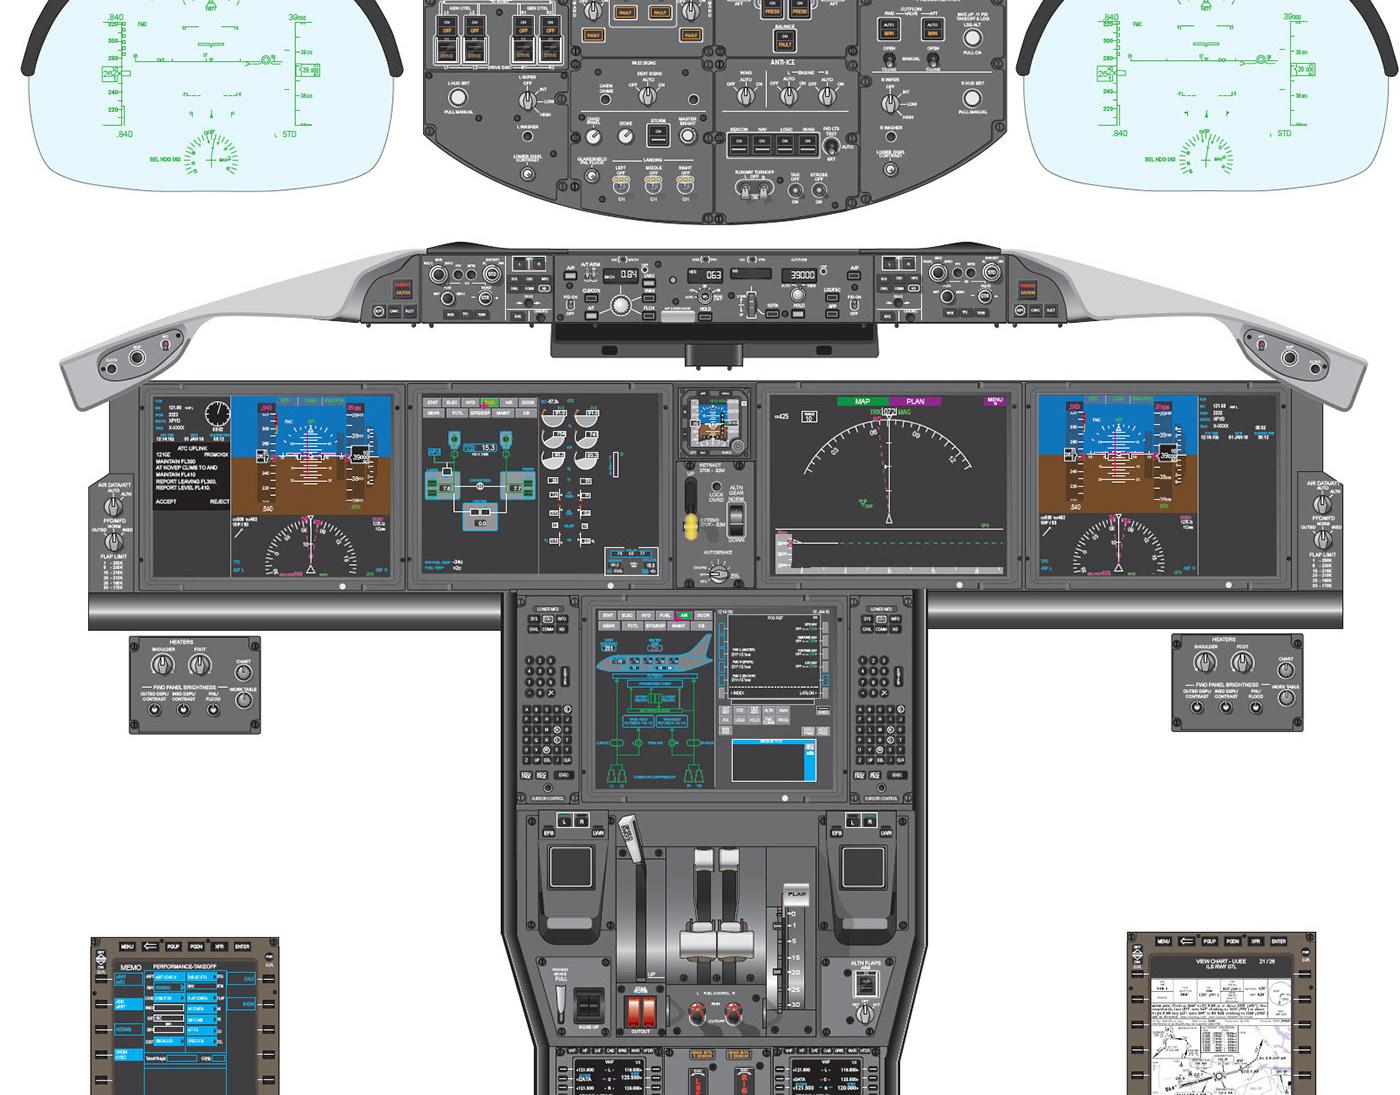 Typhoon H Pro >> Glyn Chadwick - Boeing 787-8 Cockpit Diagram